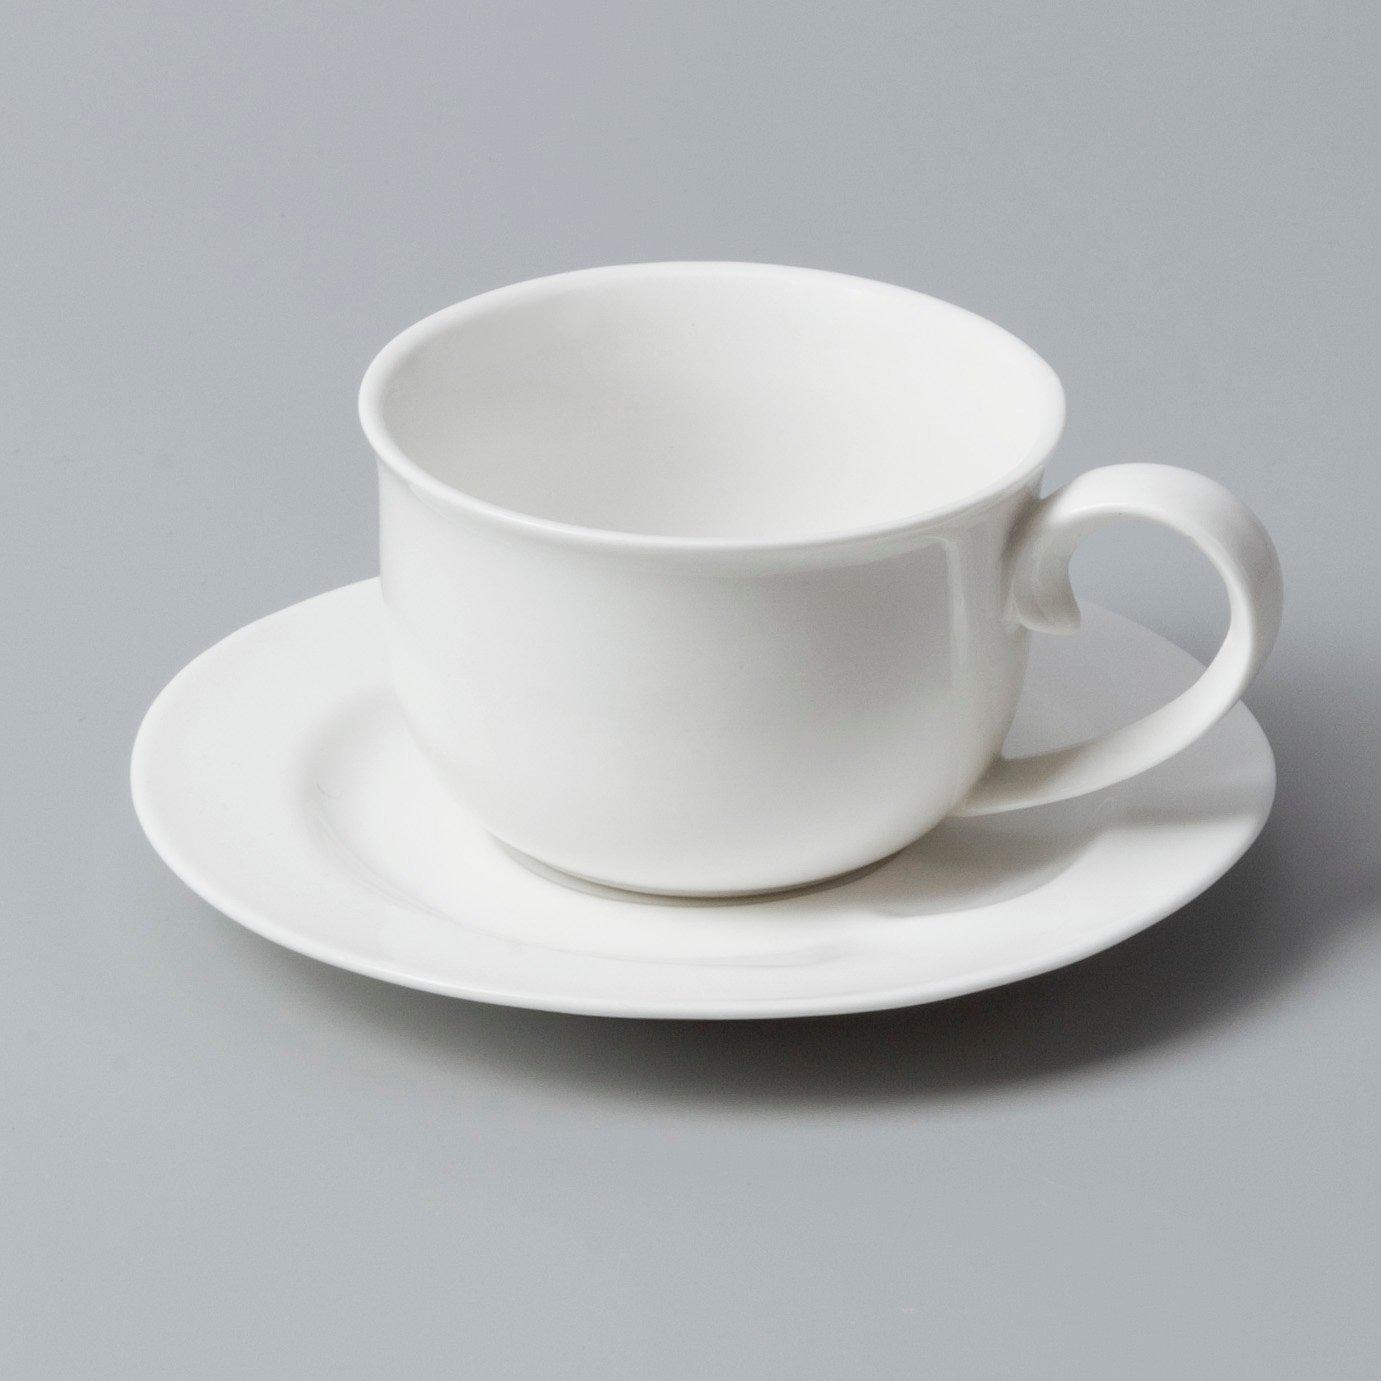 glaze best porcelain dinnerware in the world Italian style manufacturerfor home